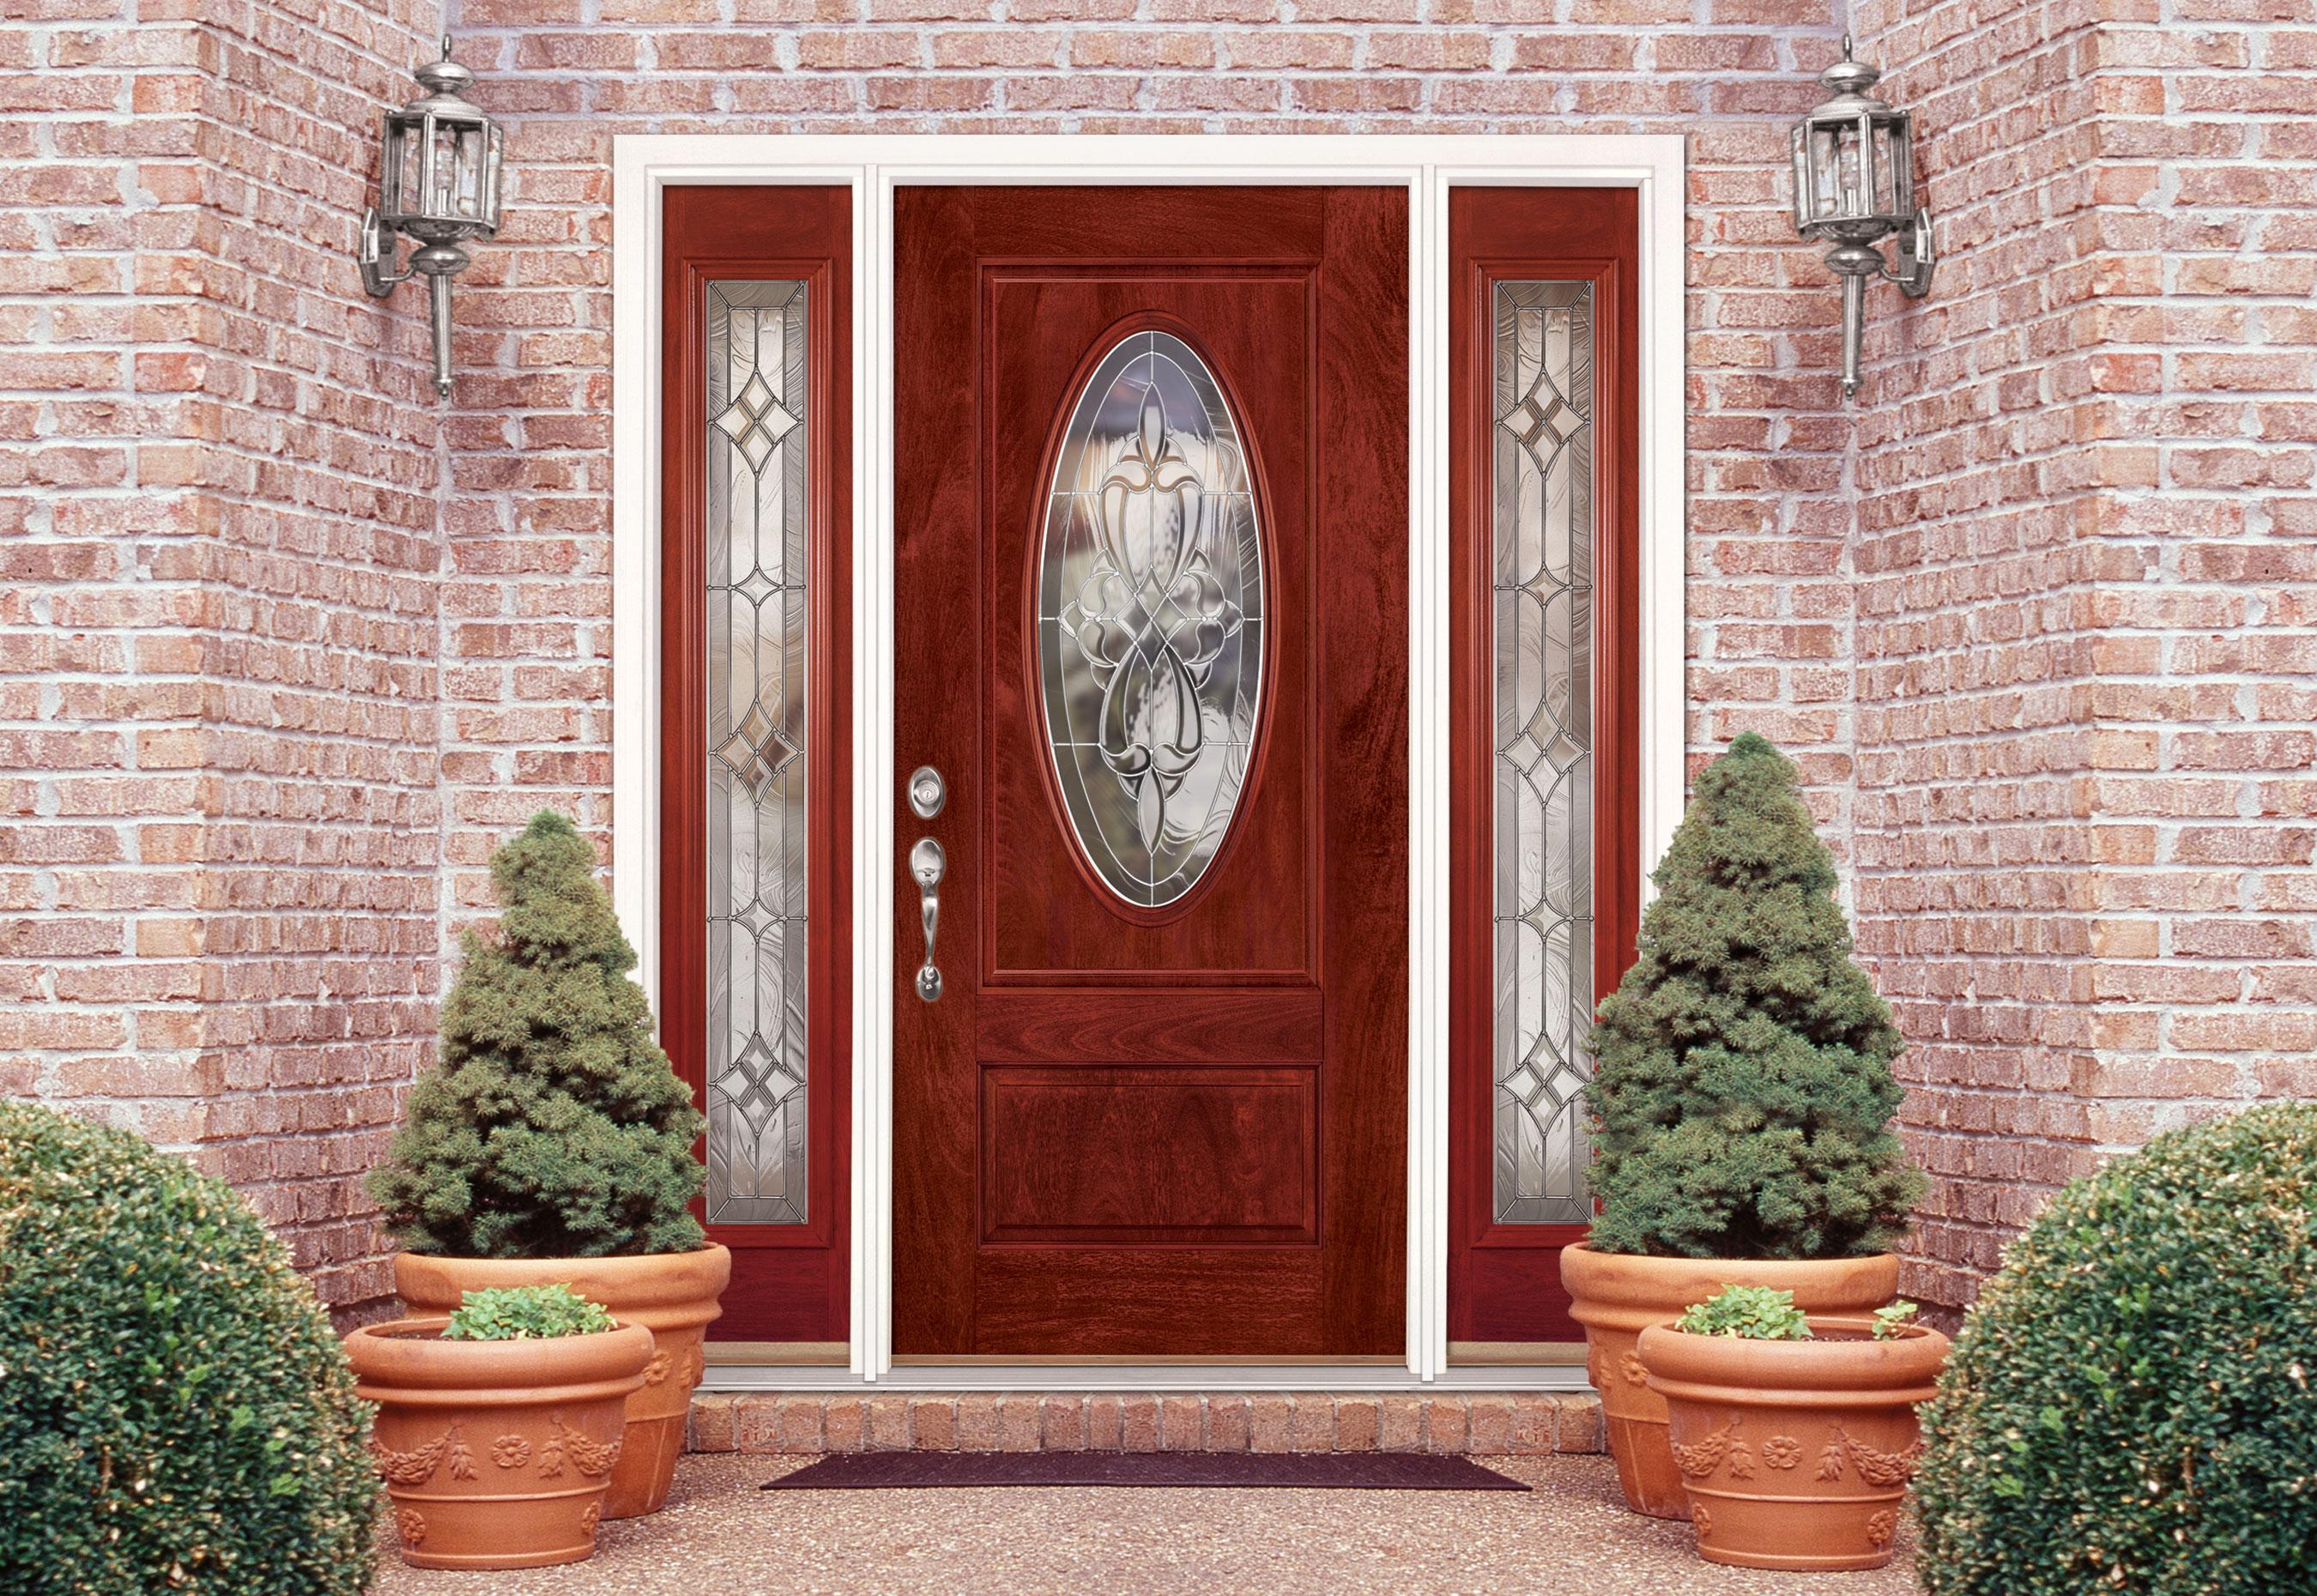 Signamark doors low cost high energy savings builders surplus for Signamark interior glass doors